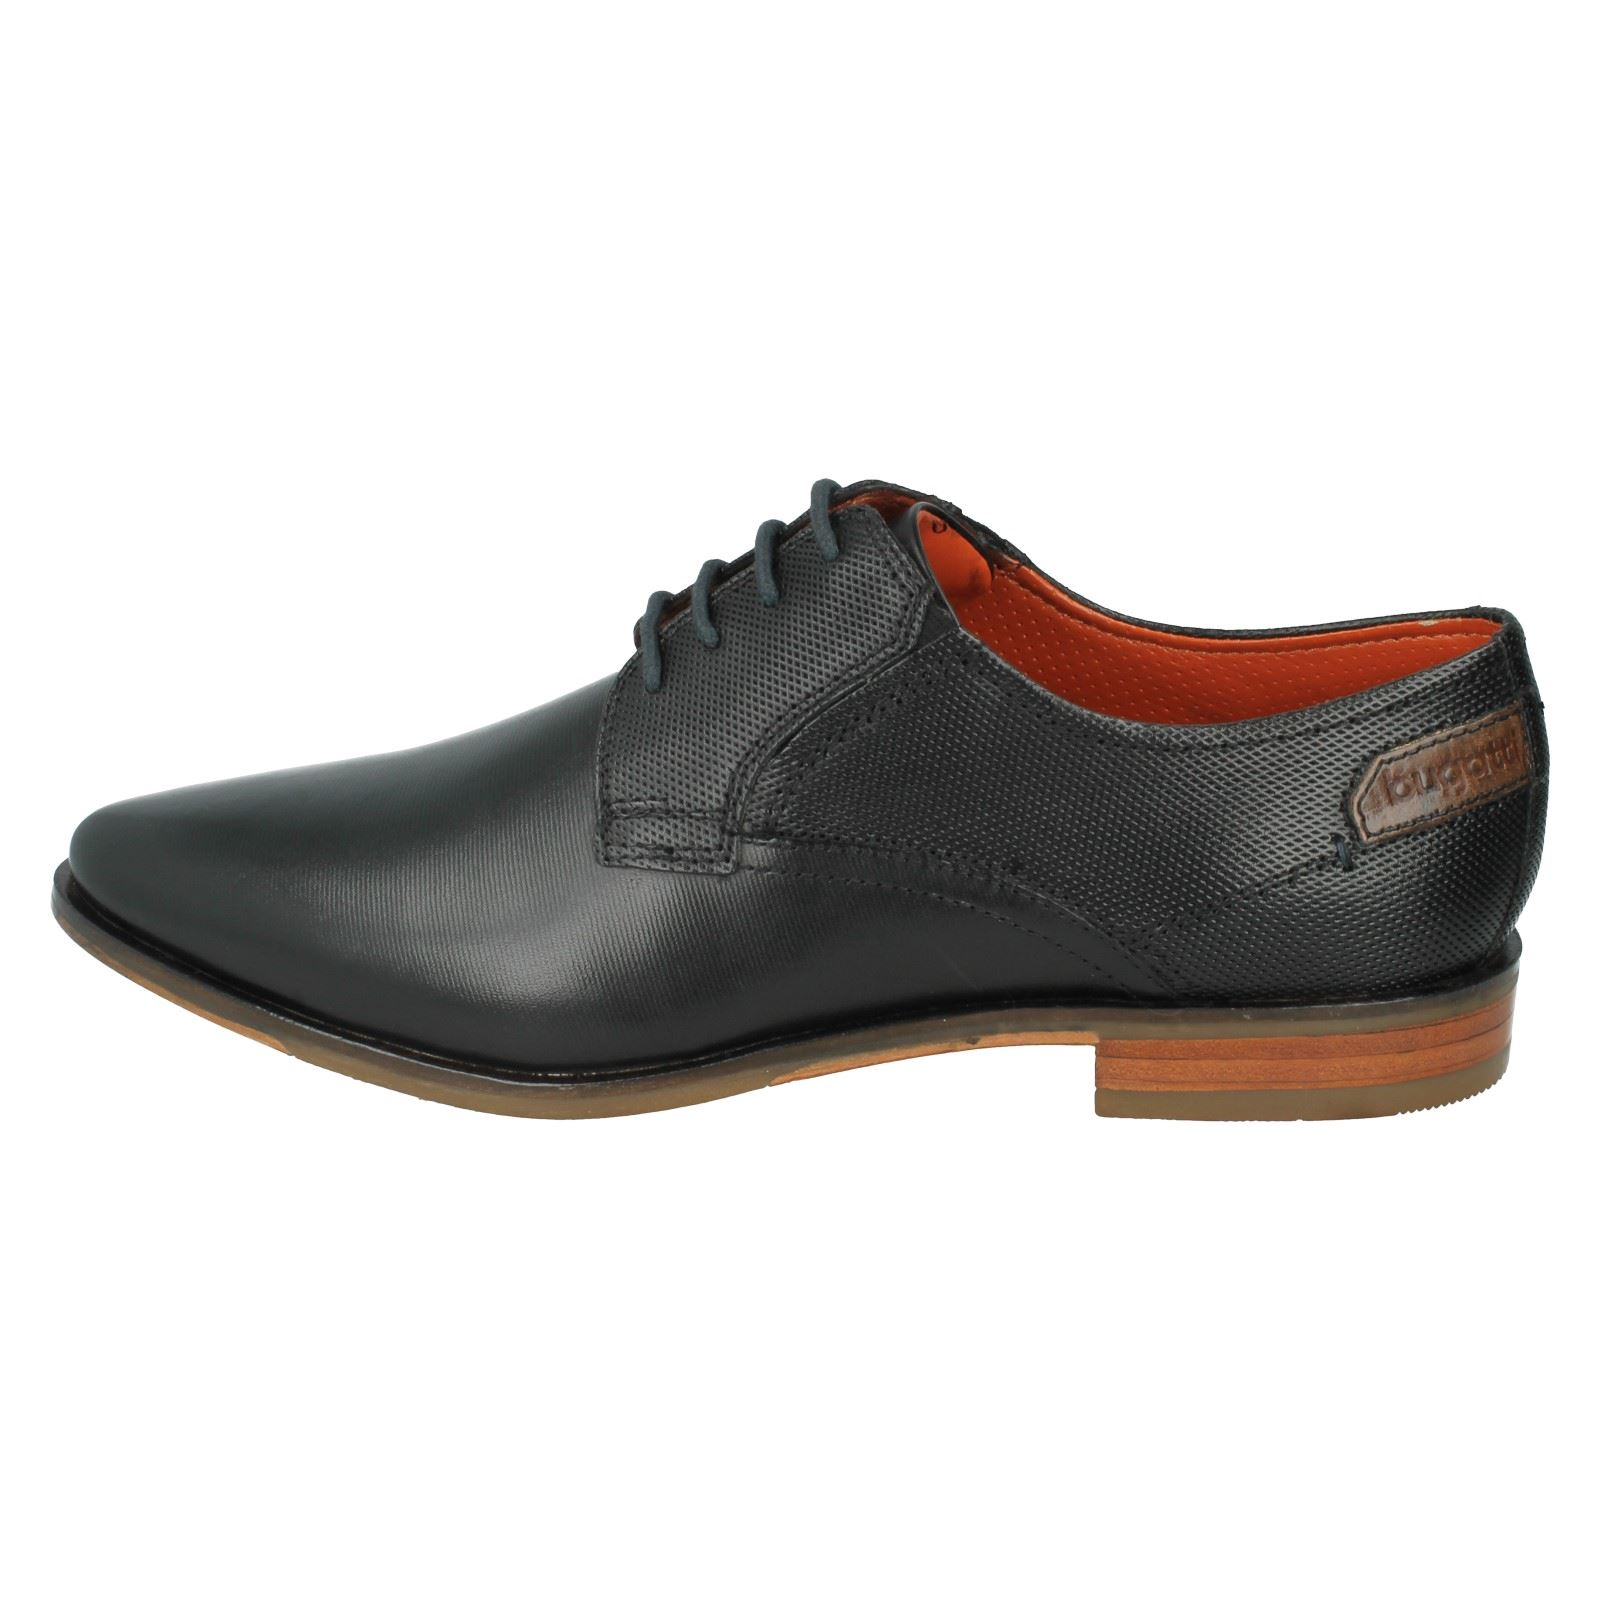 Mens Bugatti Shoes Formal Shoes Bugatti Label 311-14701-1010 -w d18275